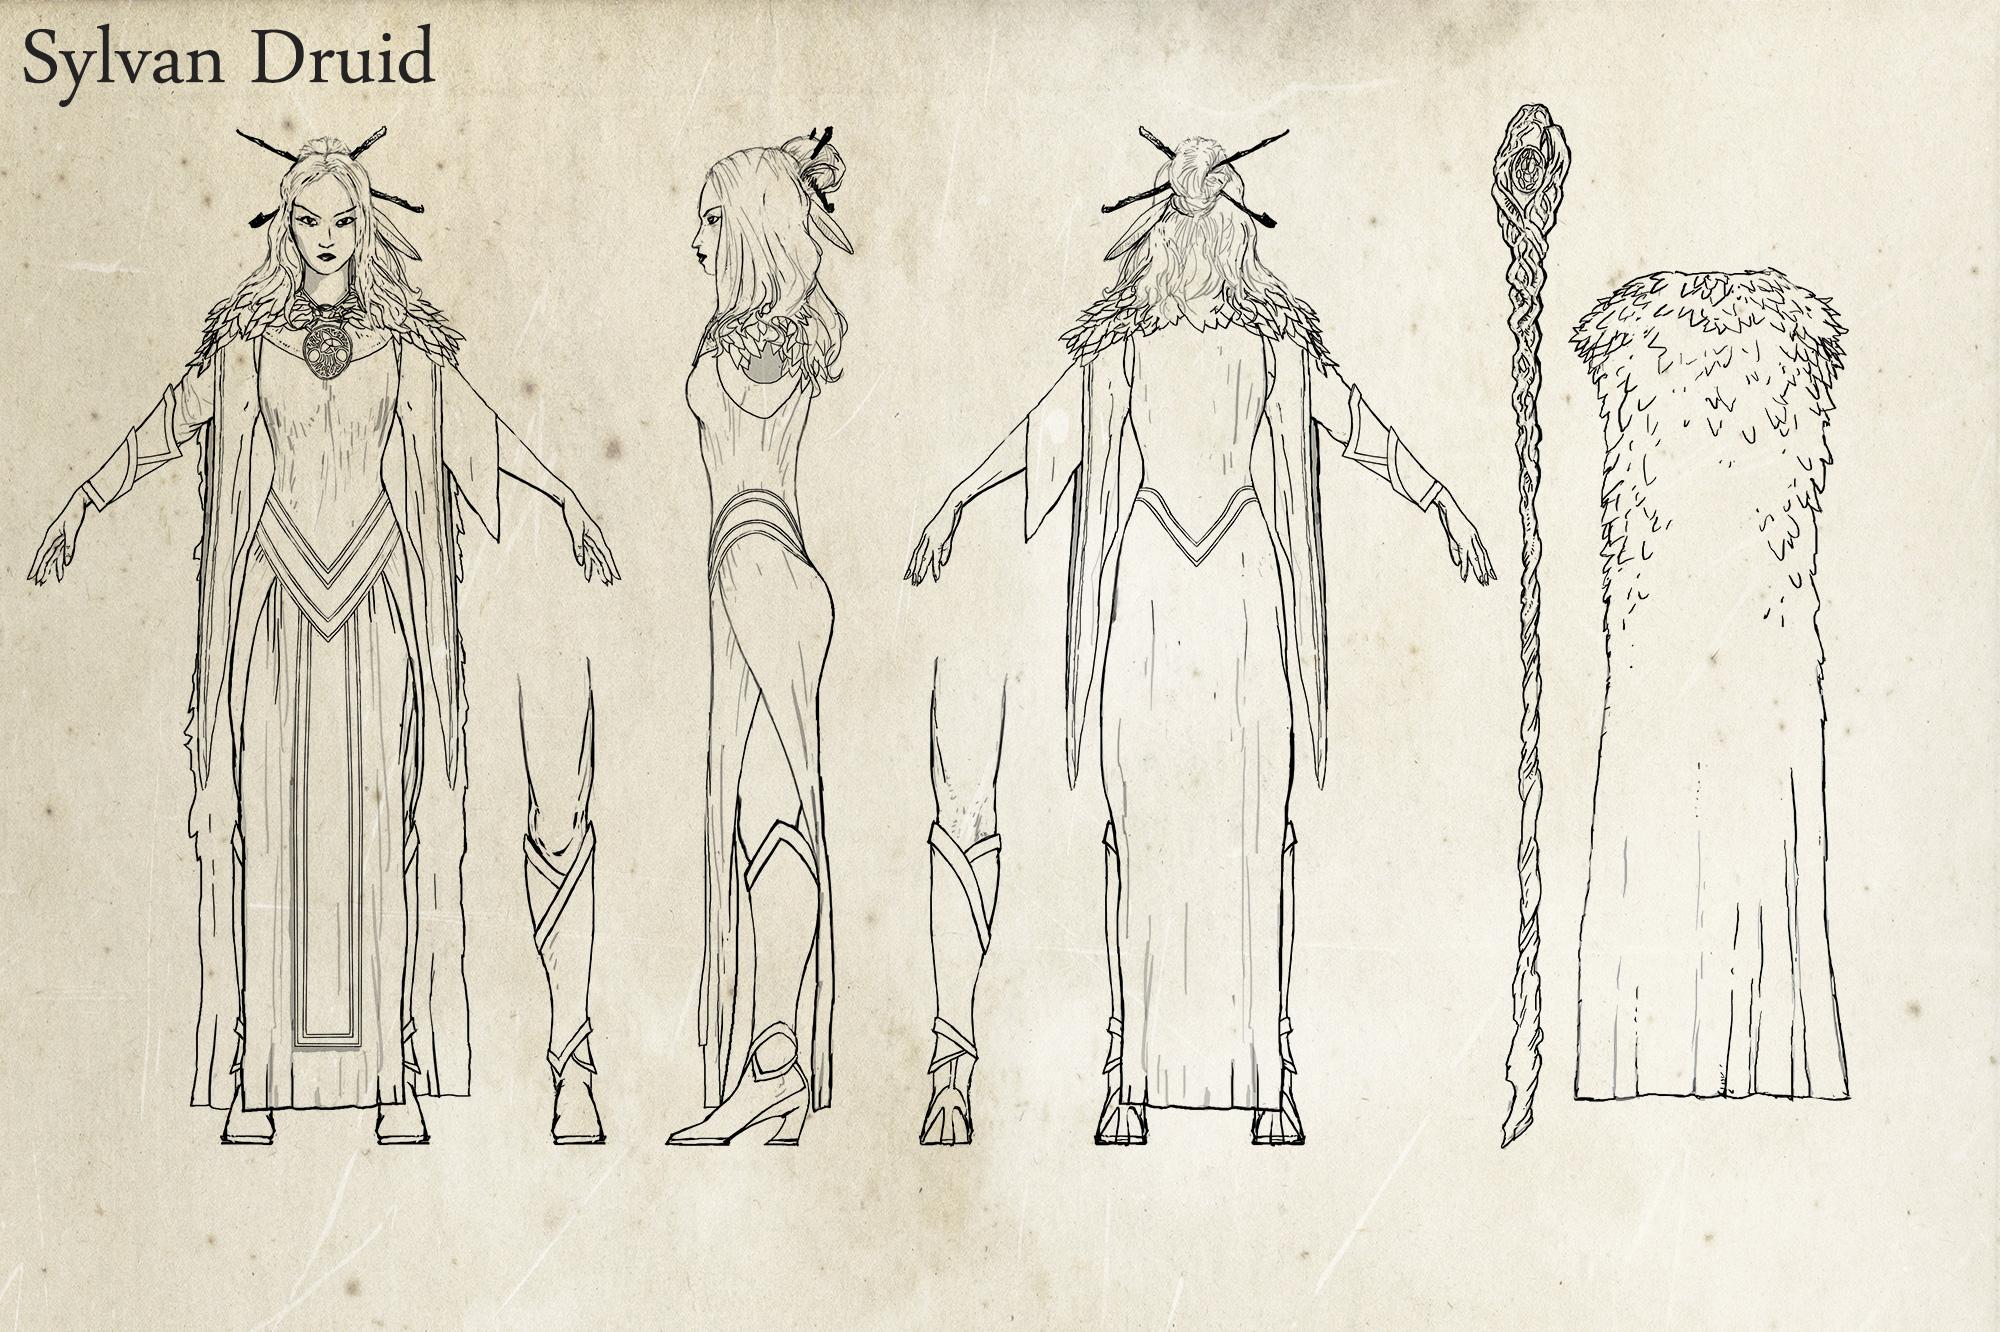 https://ubistatic-a.akamaihd.net/0004/prod/images/150624_Sylvan_2/MMH7_Druid_T.jpg